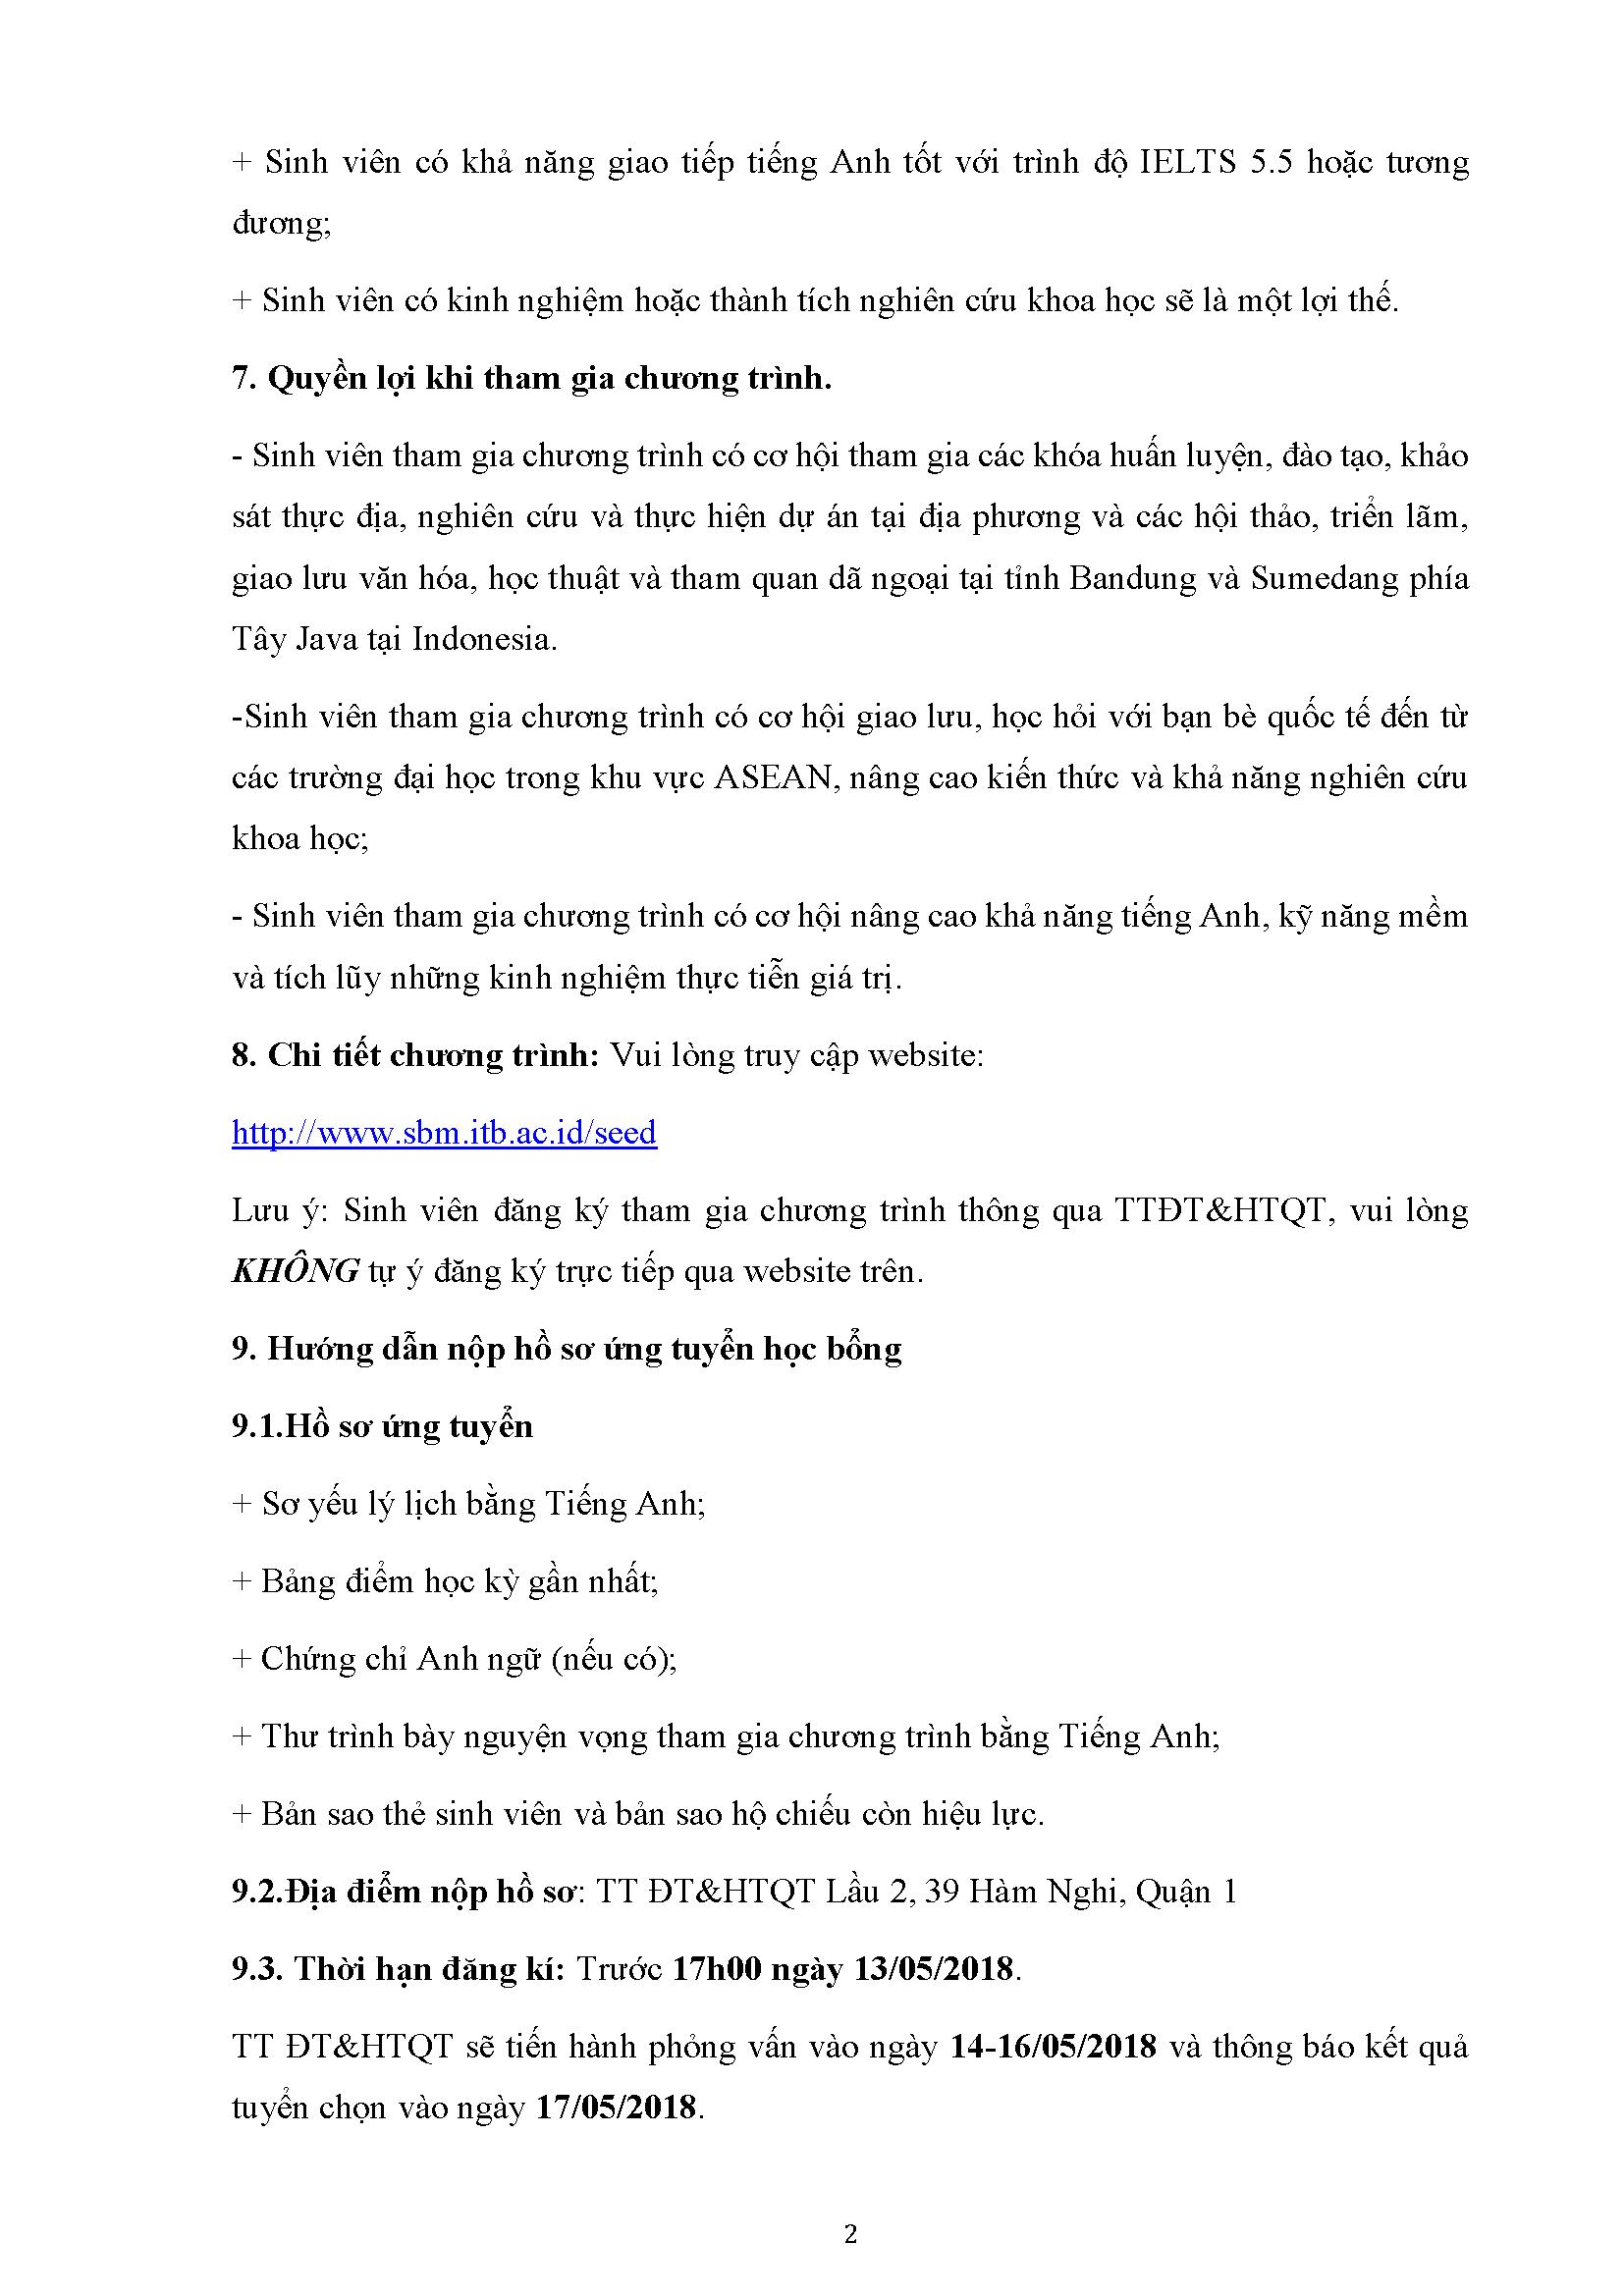 Thong bao hoc bong chuong trinh SEED Indonesia_Page_2